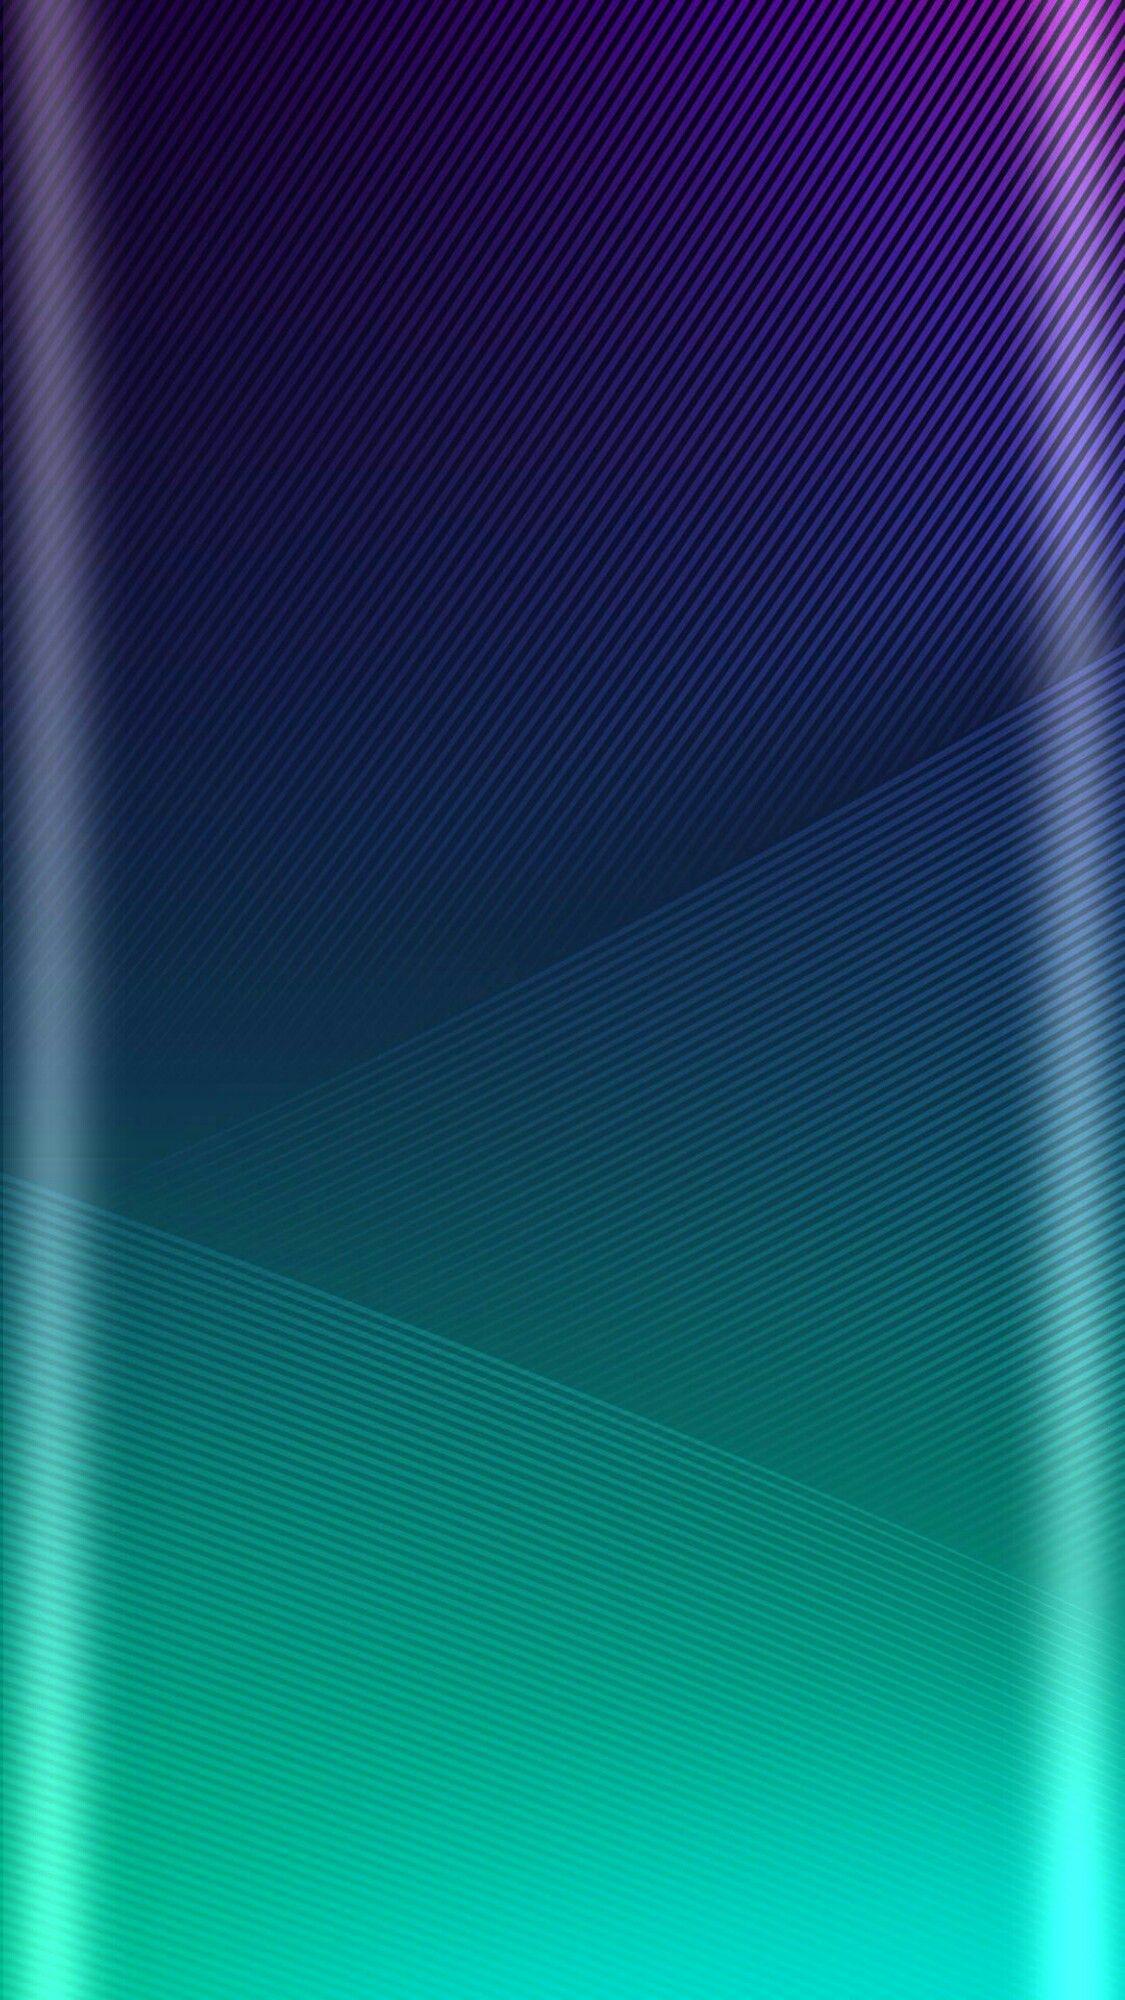 Samsung iPhone Edge PhoneTelefon Hd Wallpaper 1125x2000